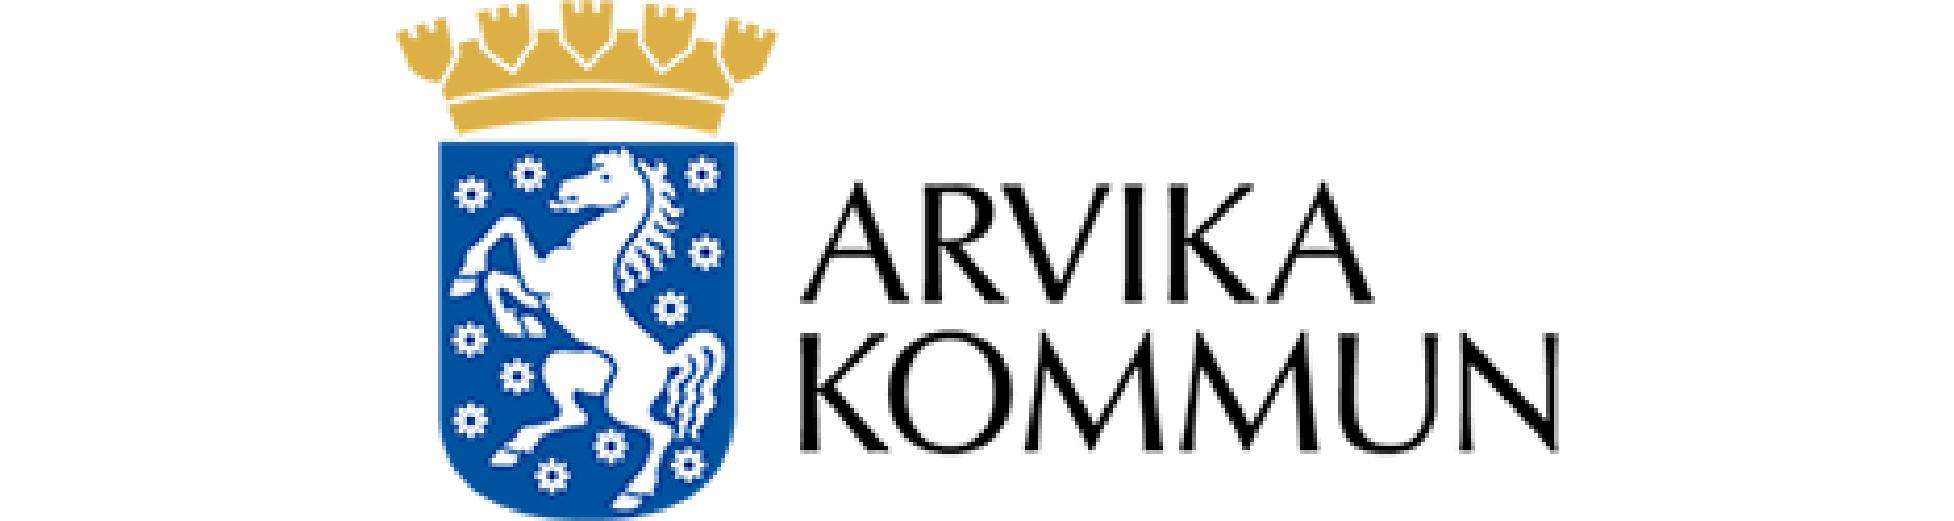 logo_arvika-logotyp